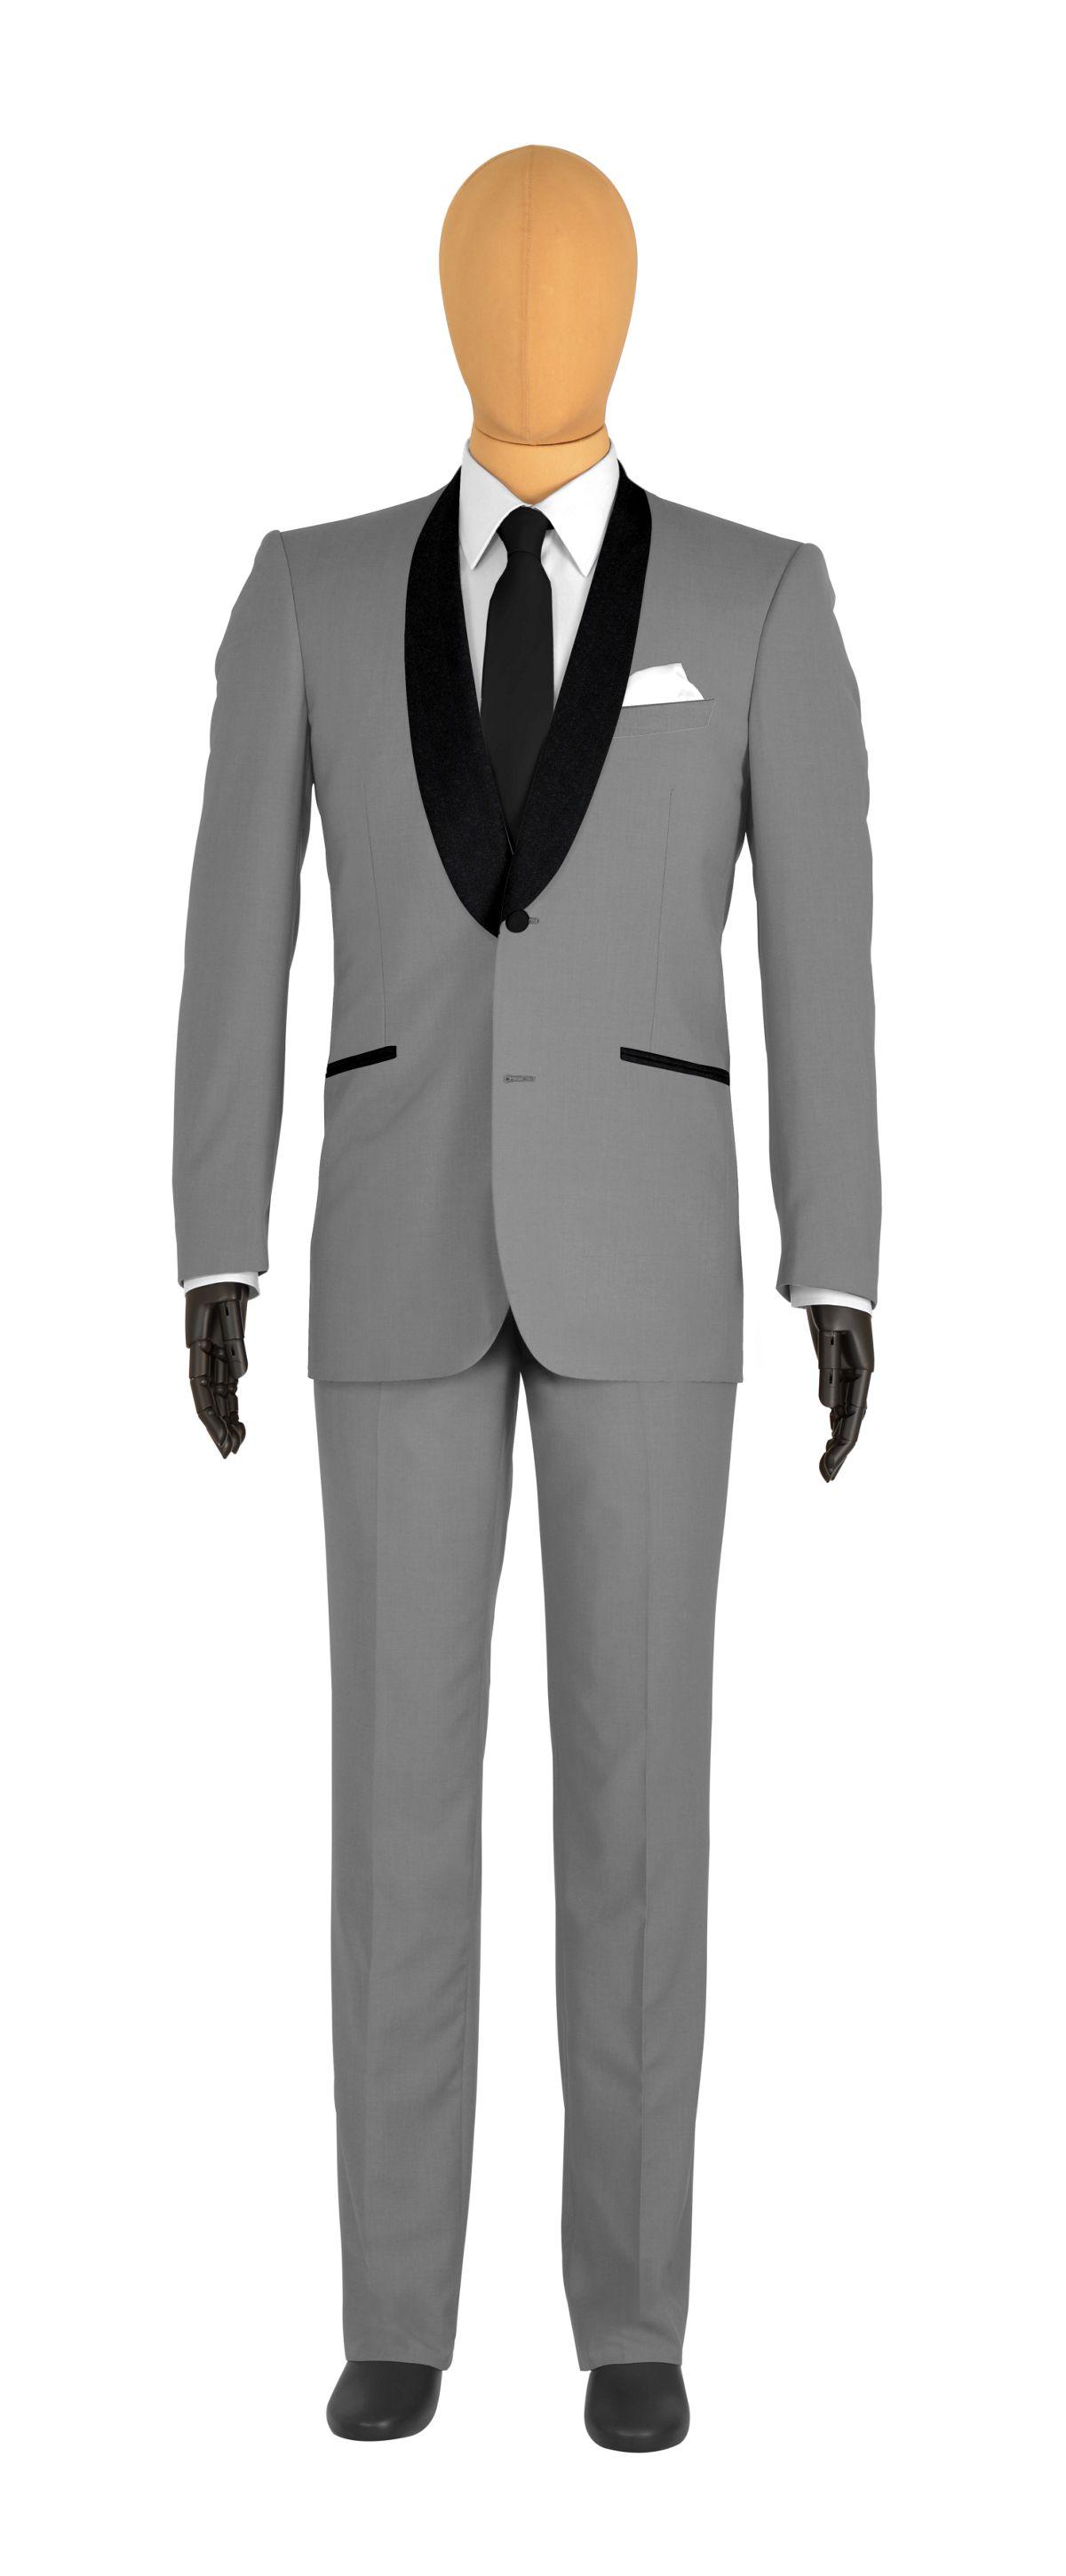 Costume Mariage Distinction - Gamme